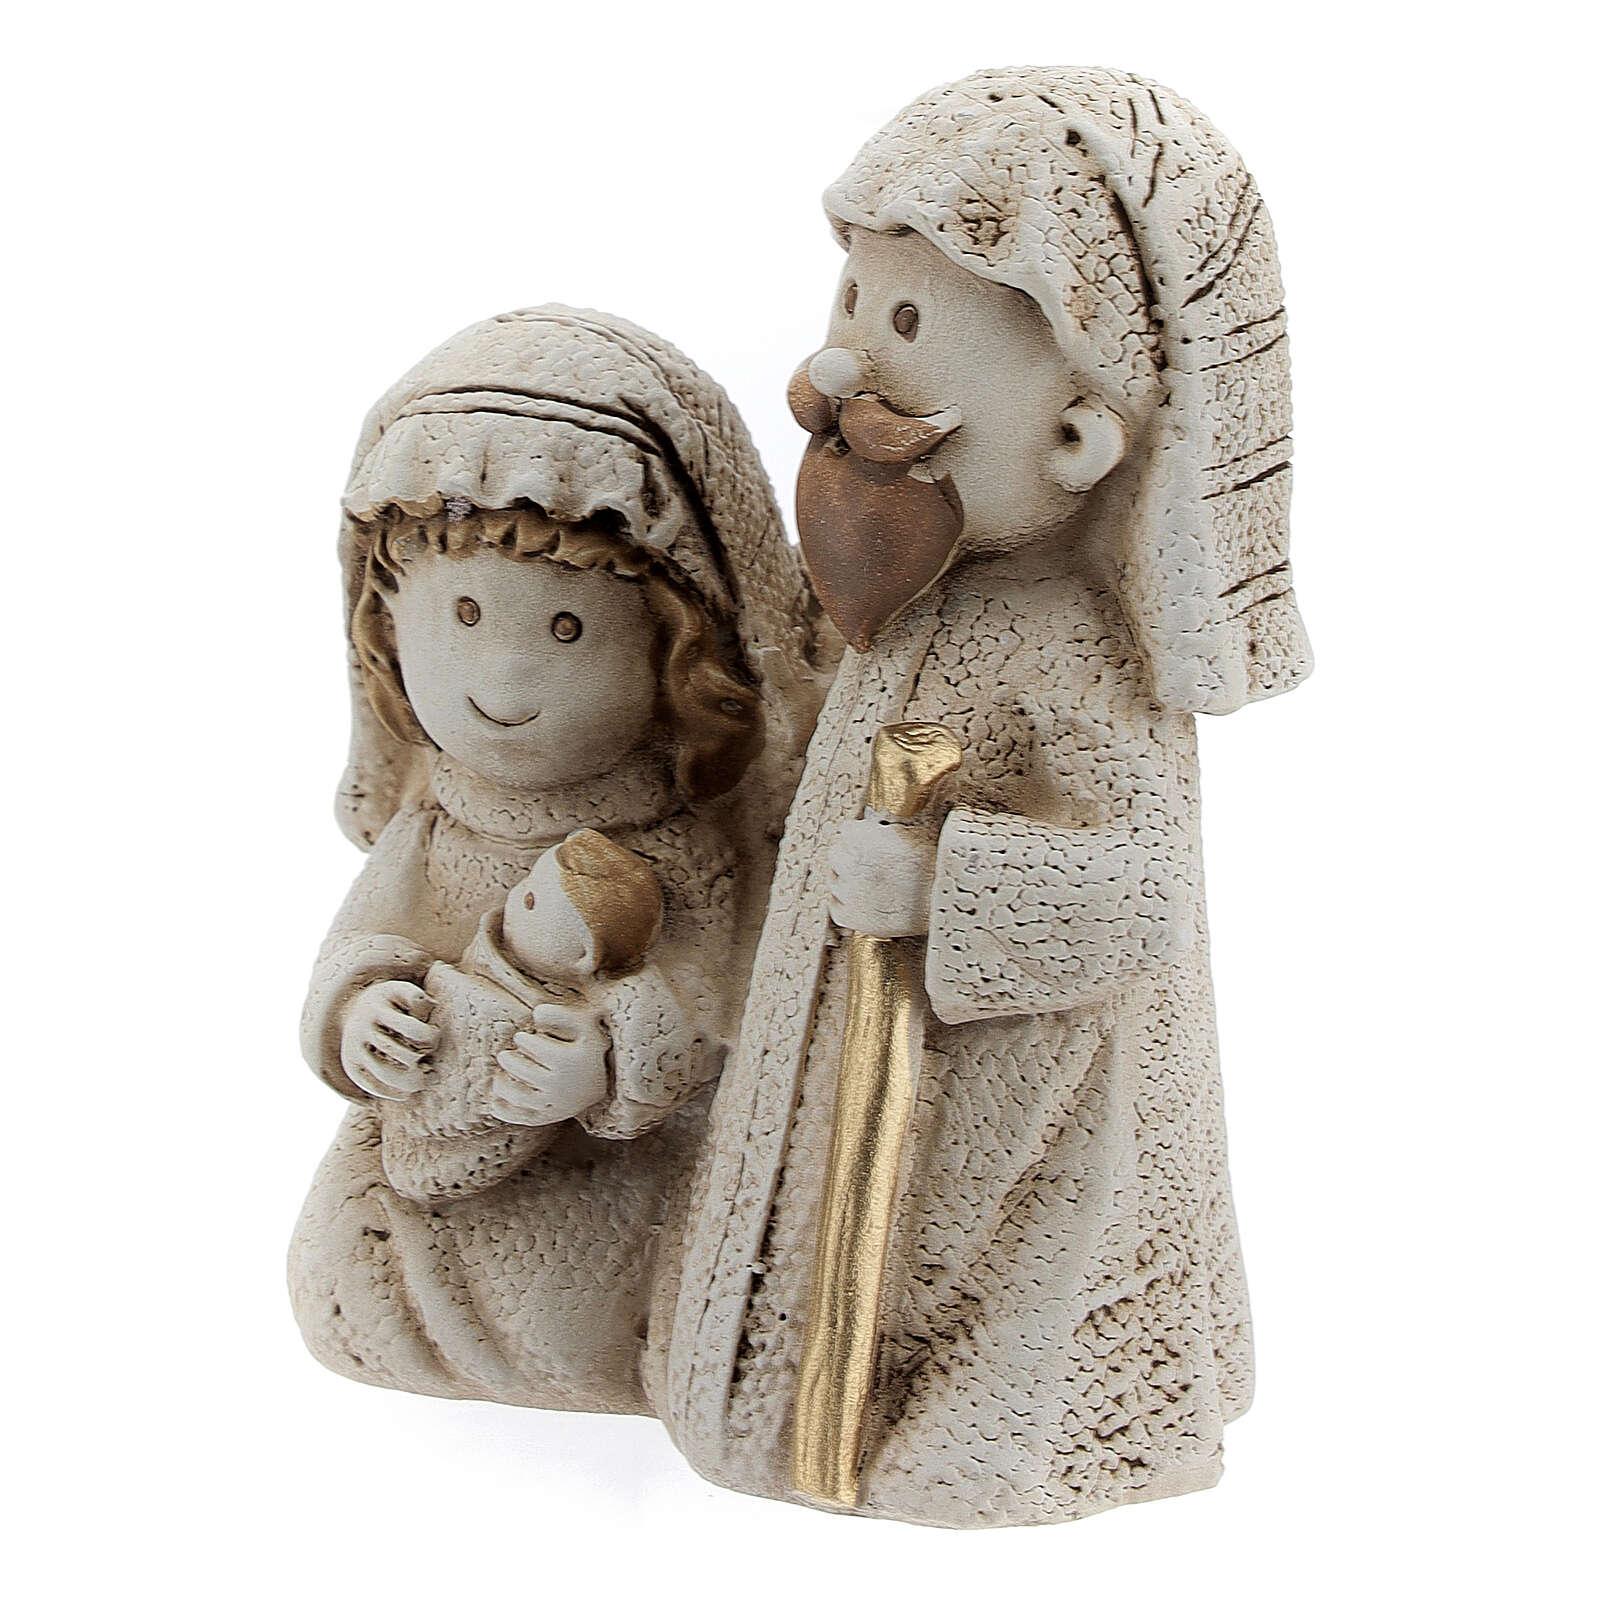 Natividad resina estilo árabe 10 cm 3